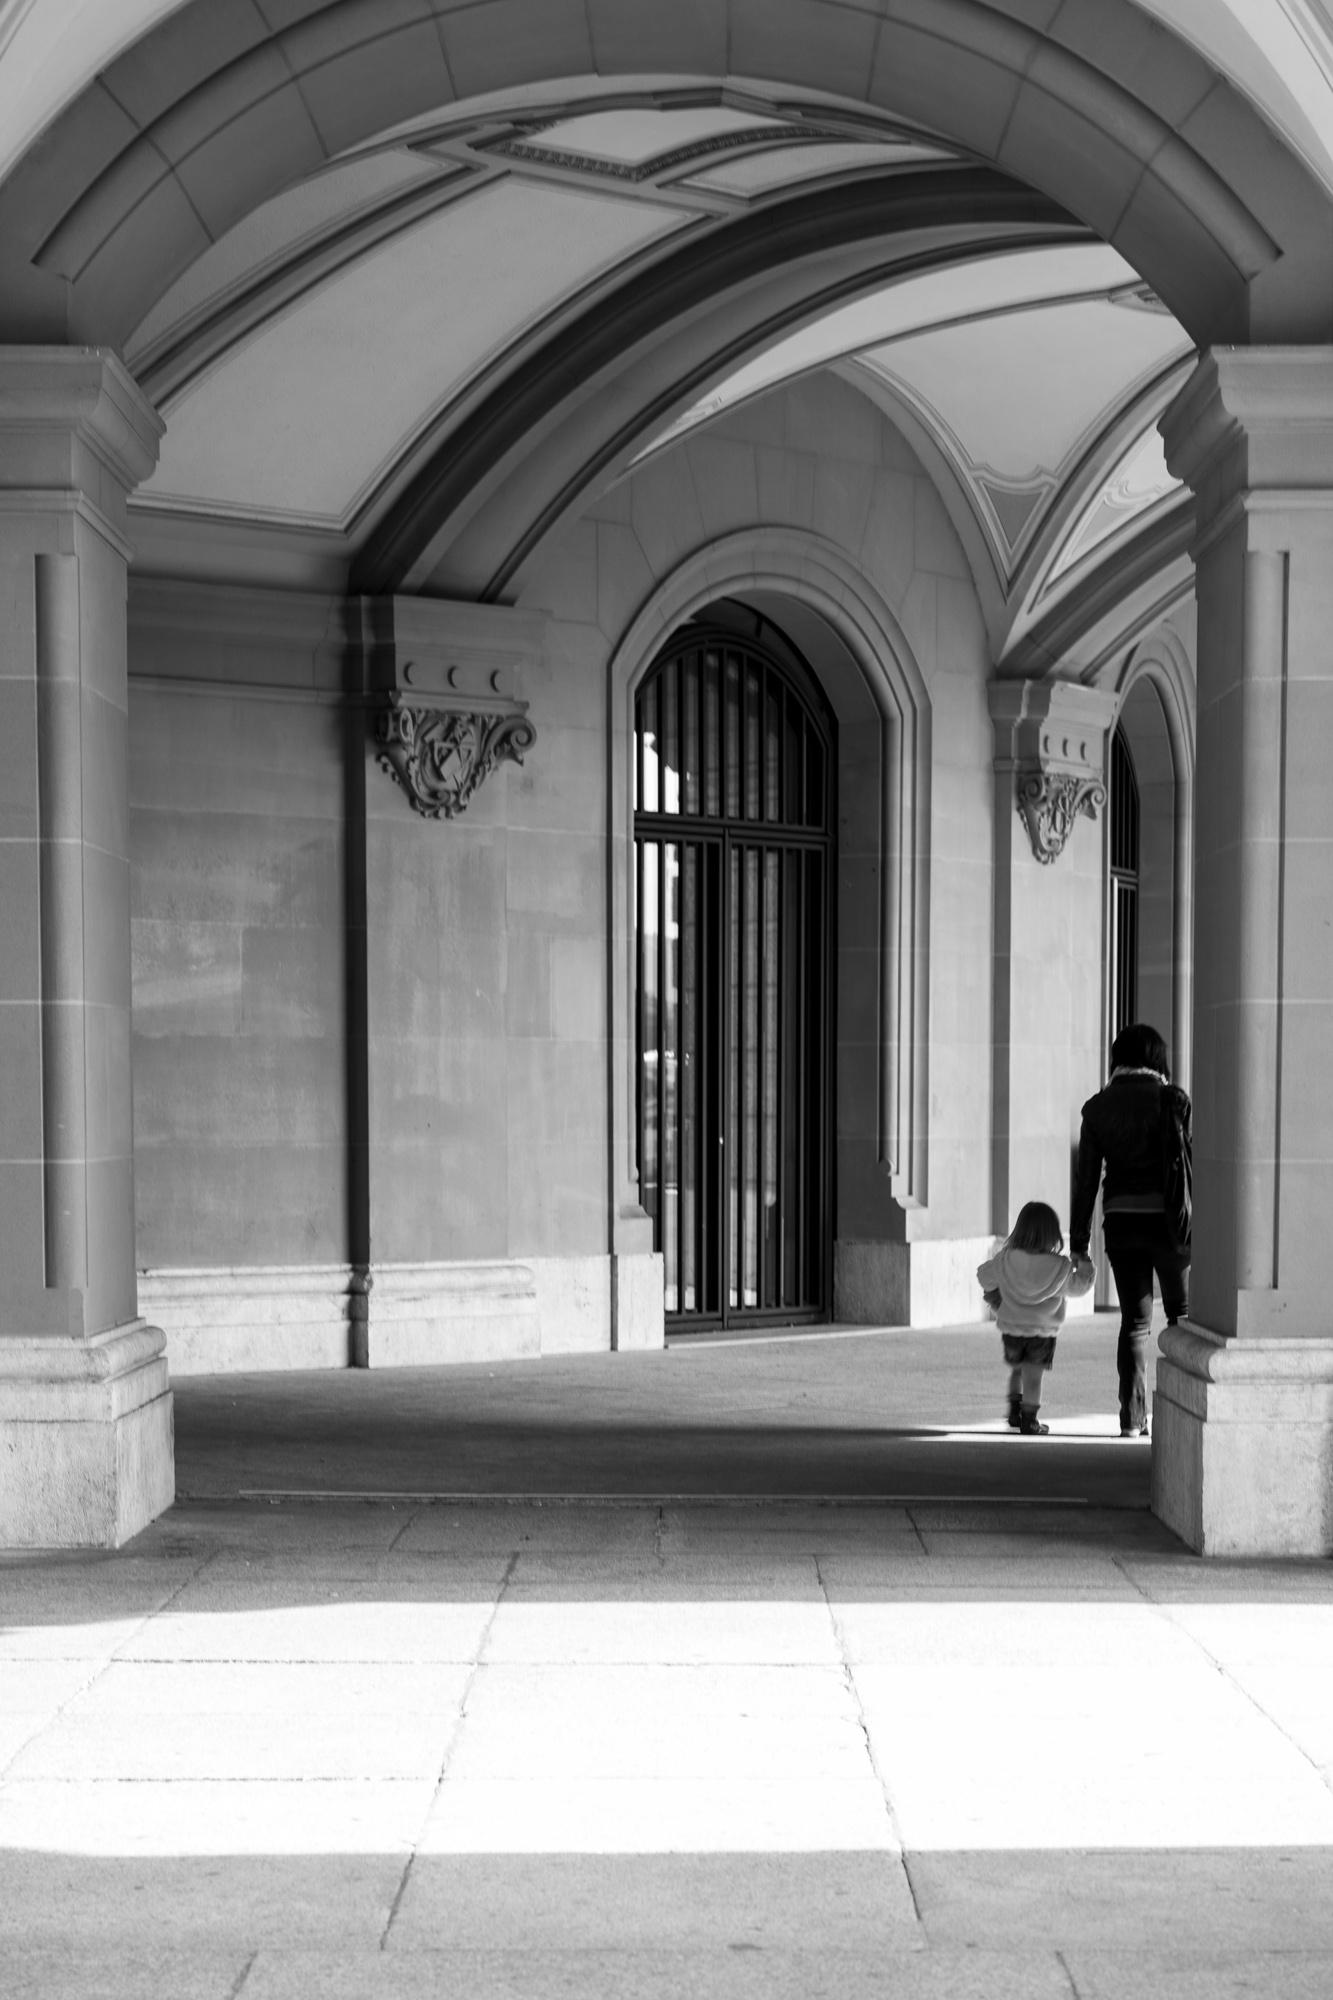 Arches in Berne